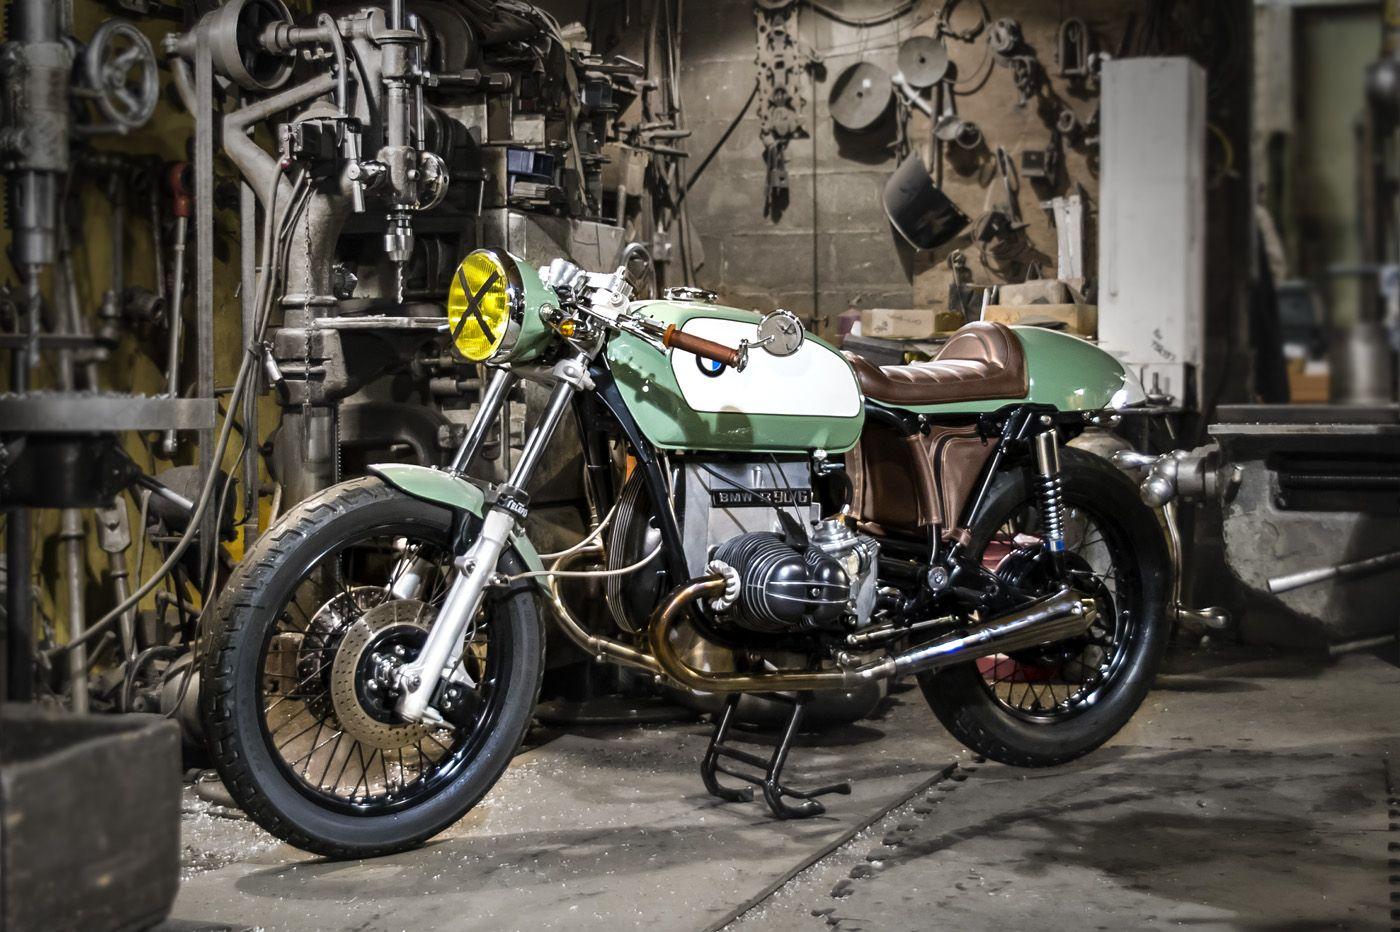 1974 BMW - Pipeburn - Purveyors of Classic Motorcycles, Cafe Racers &  Custom motorbikes